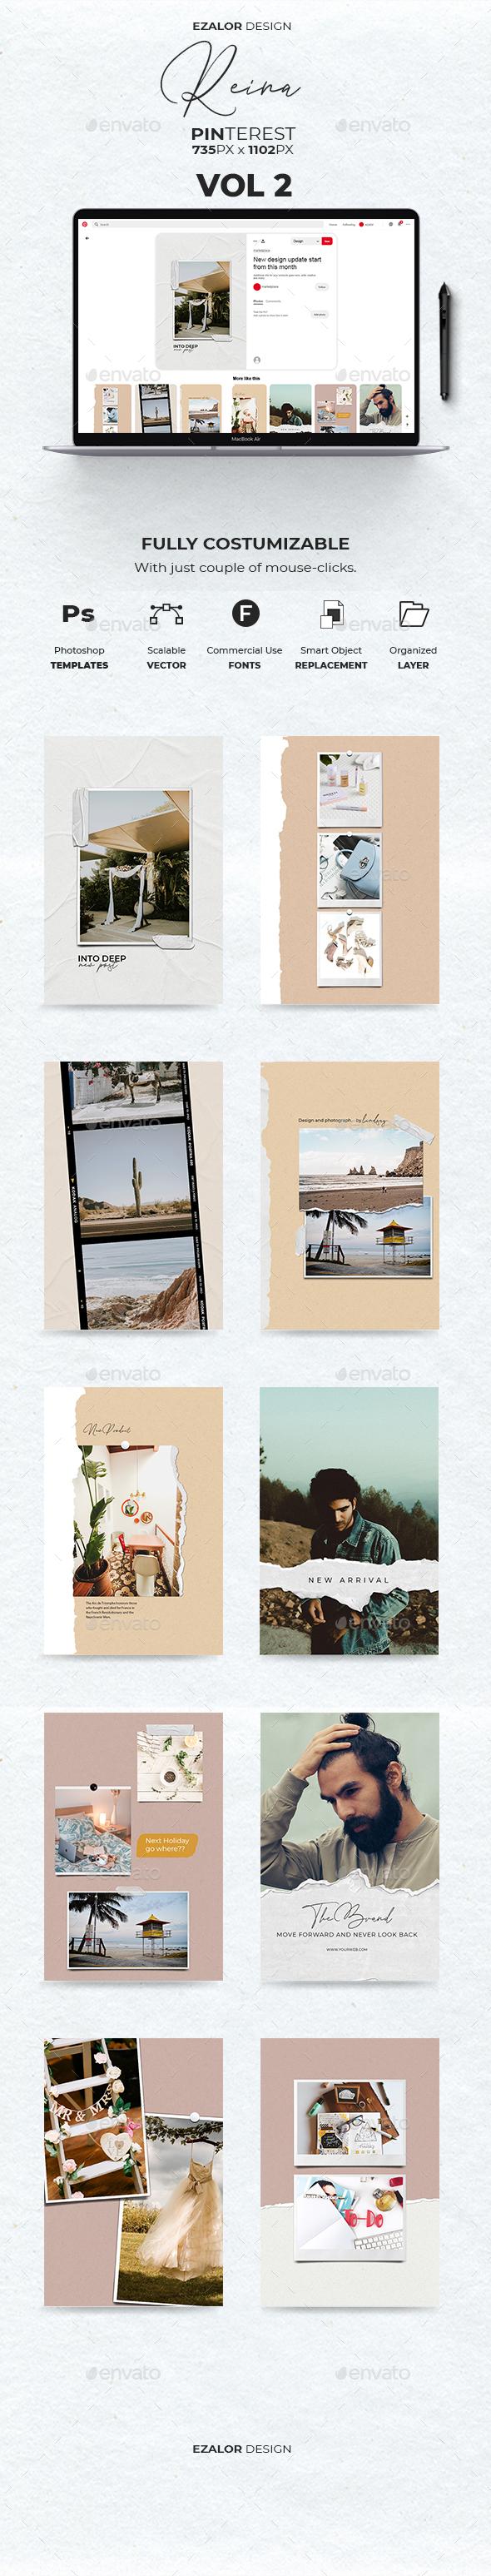 19 Pinterest Fashion Graphics, Designs & Templates